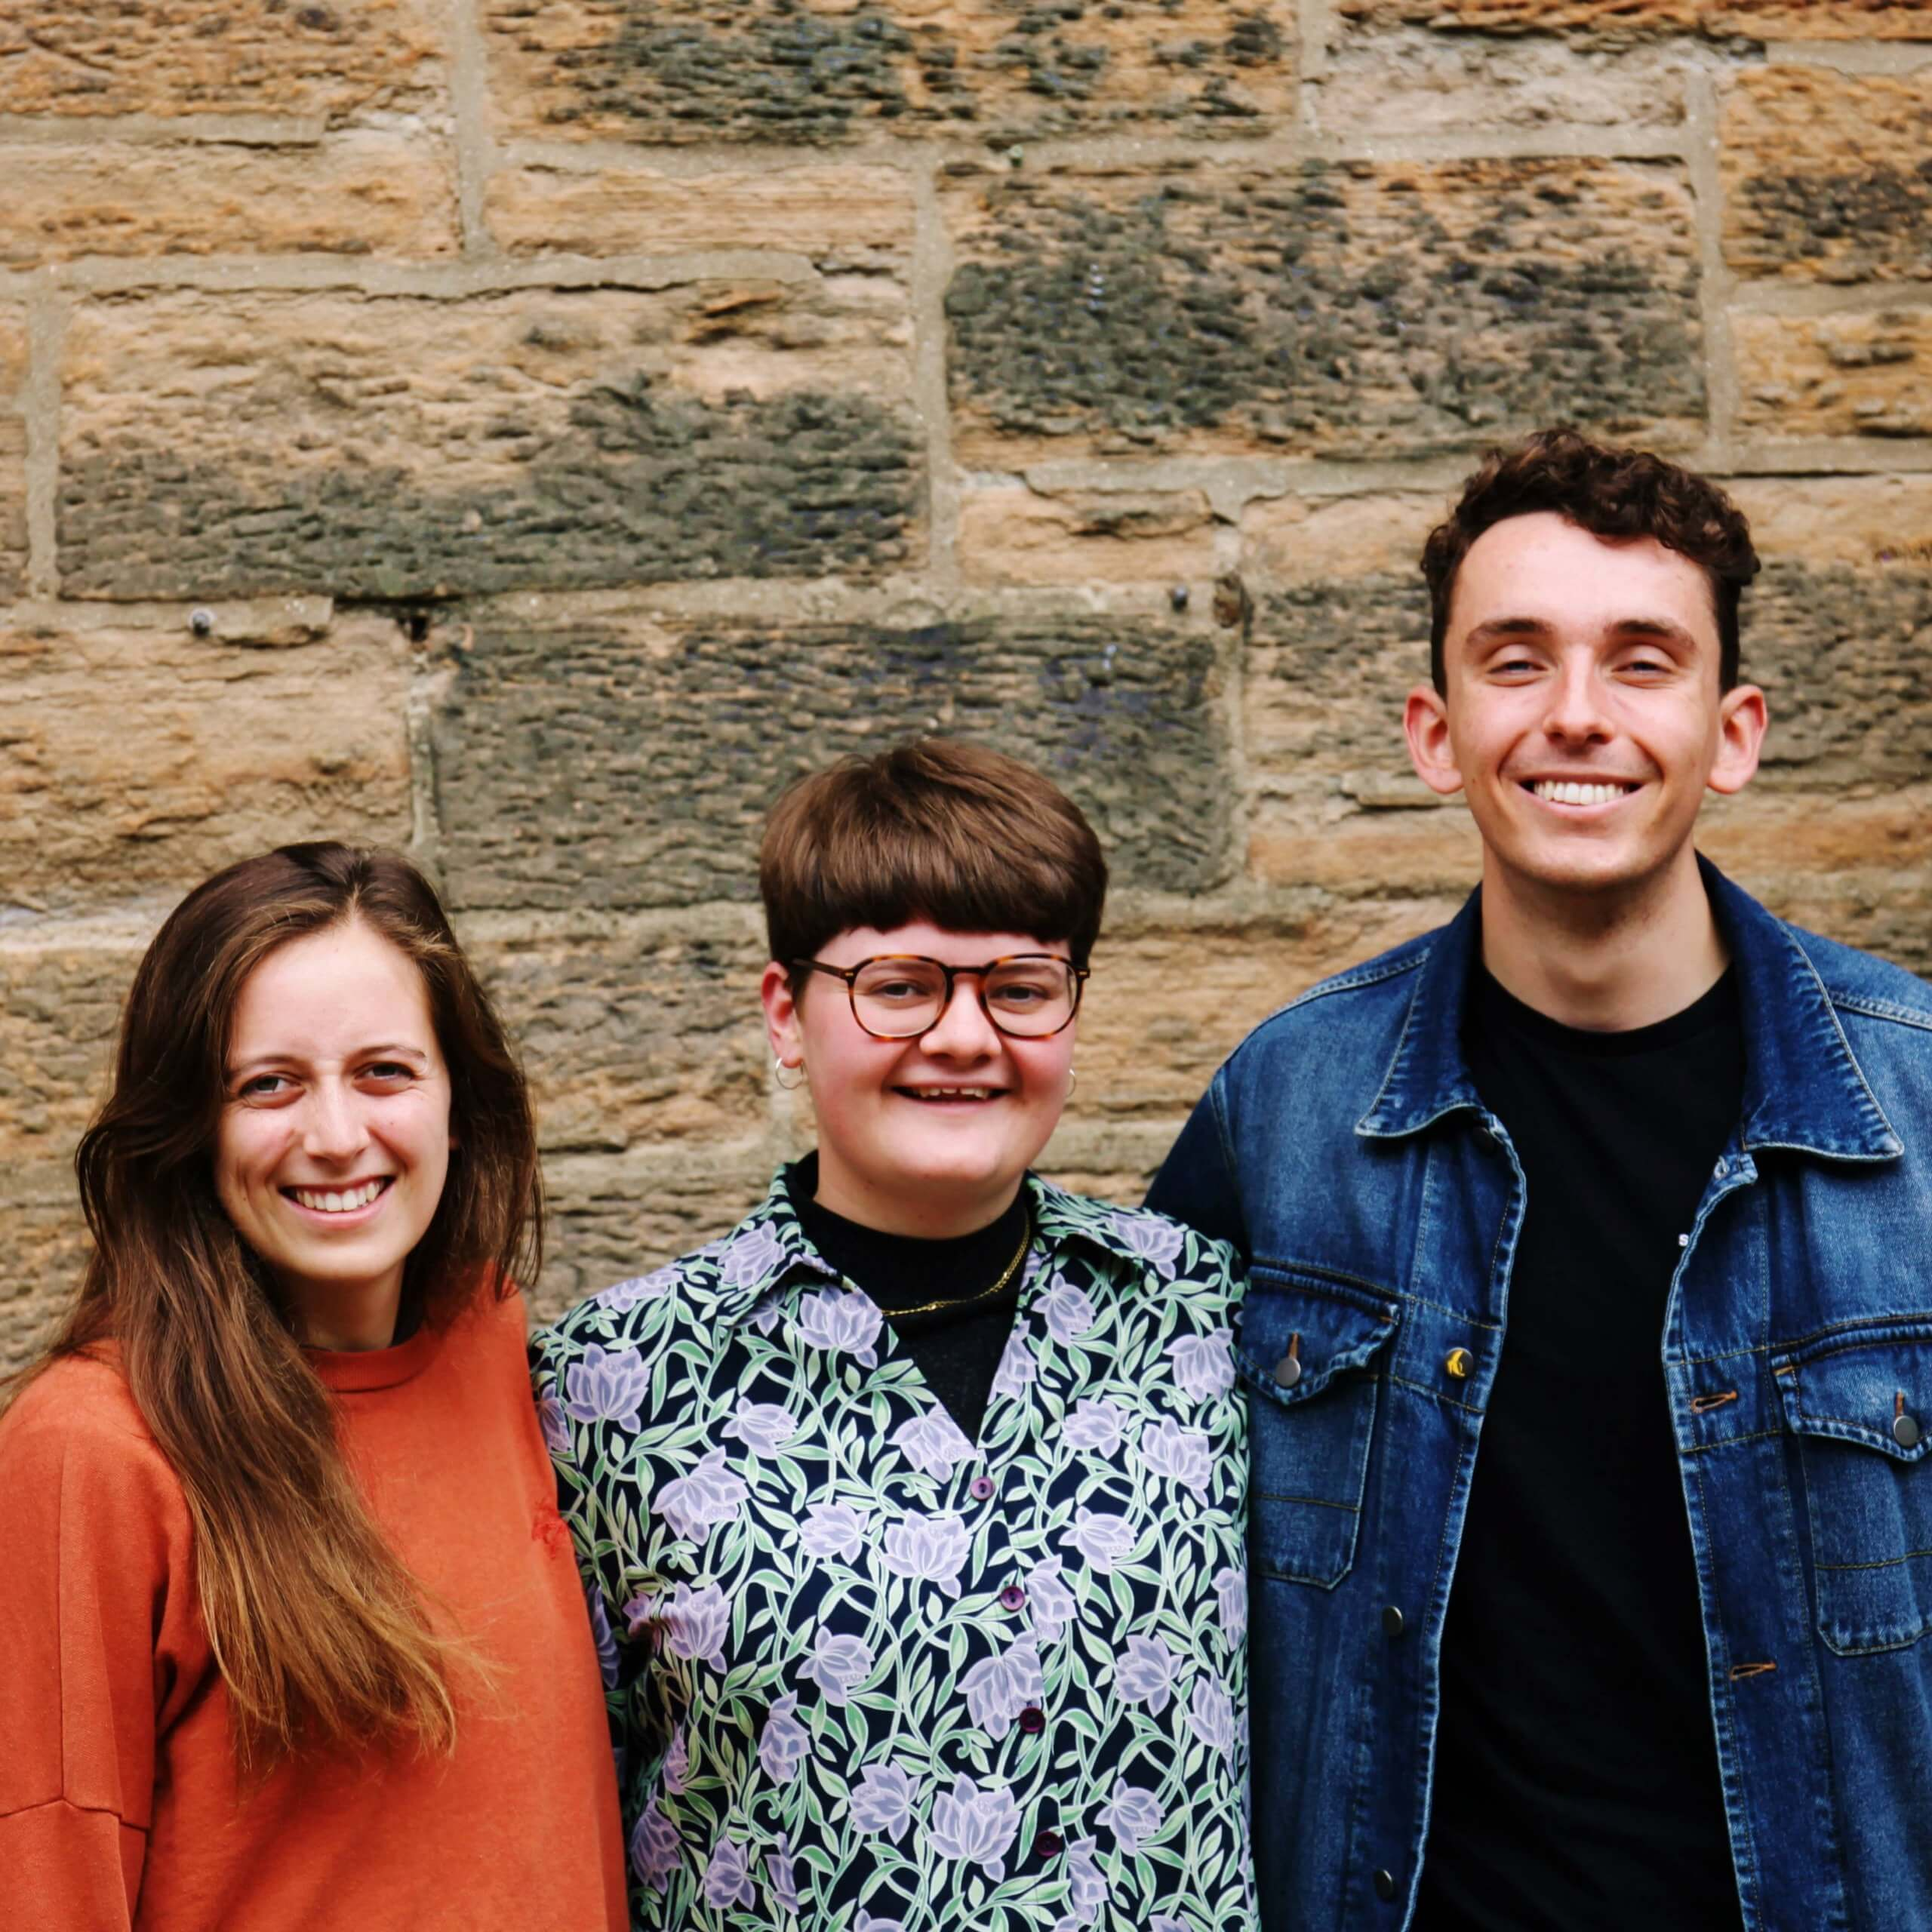 Joanna, Carrie, Nate